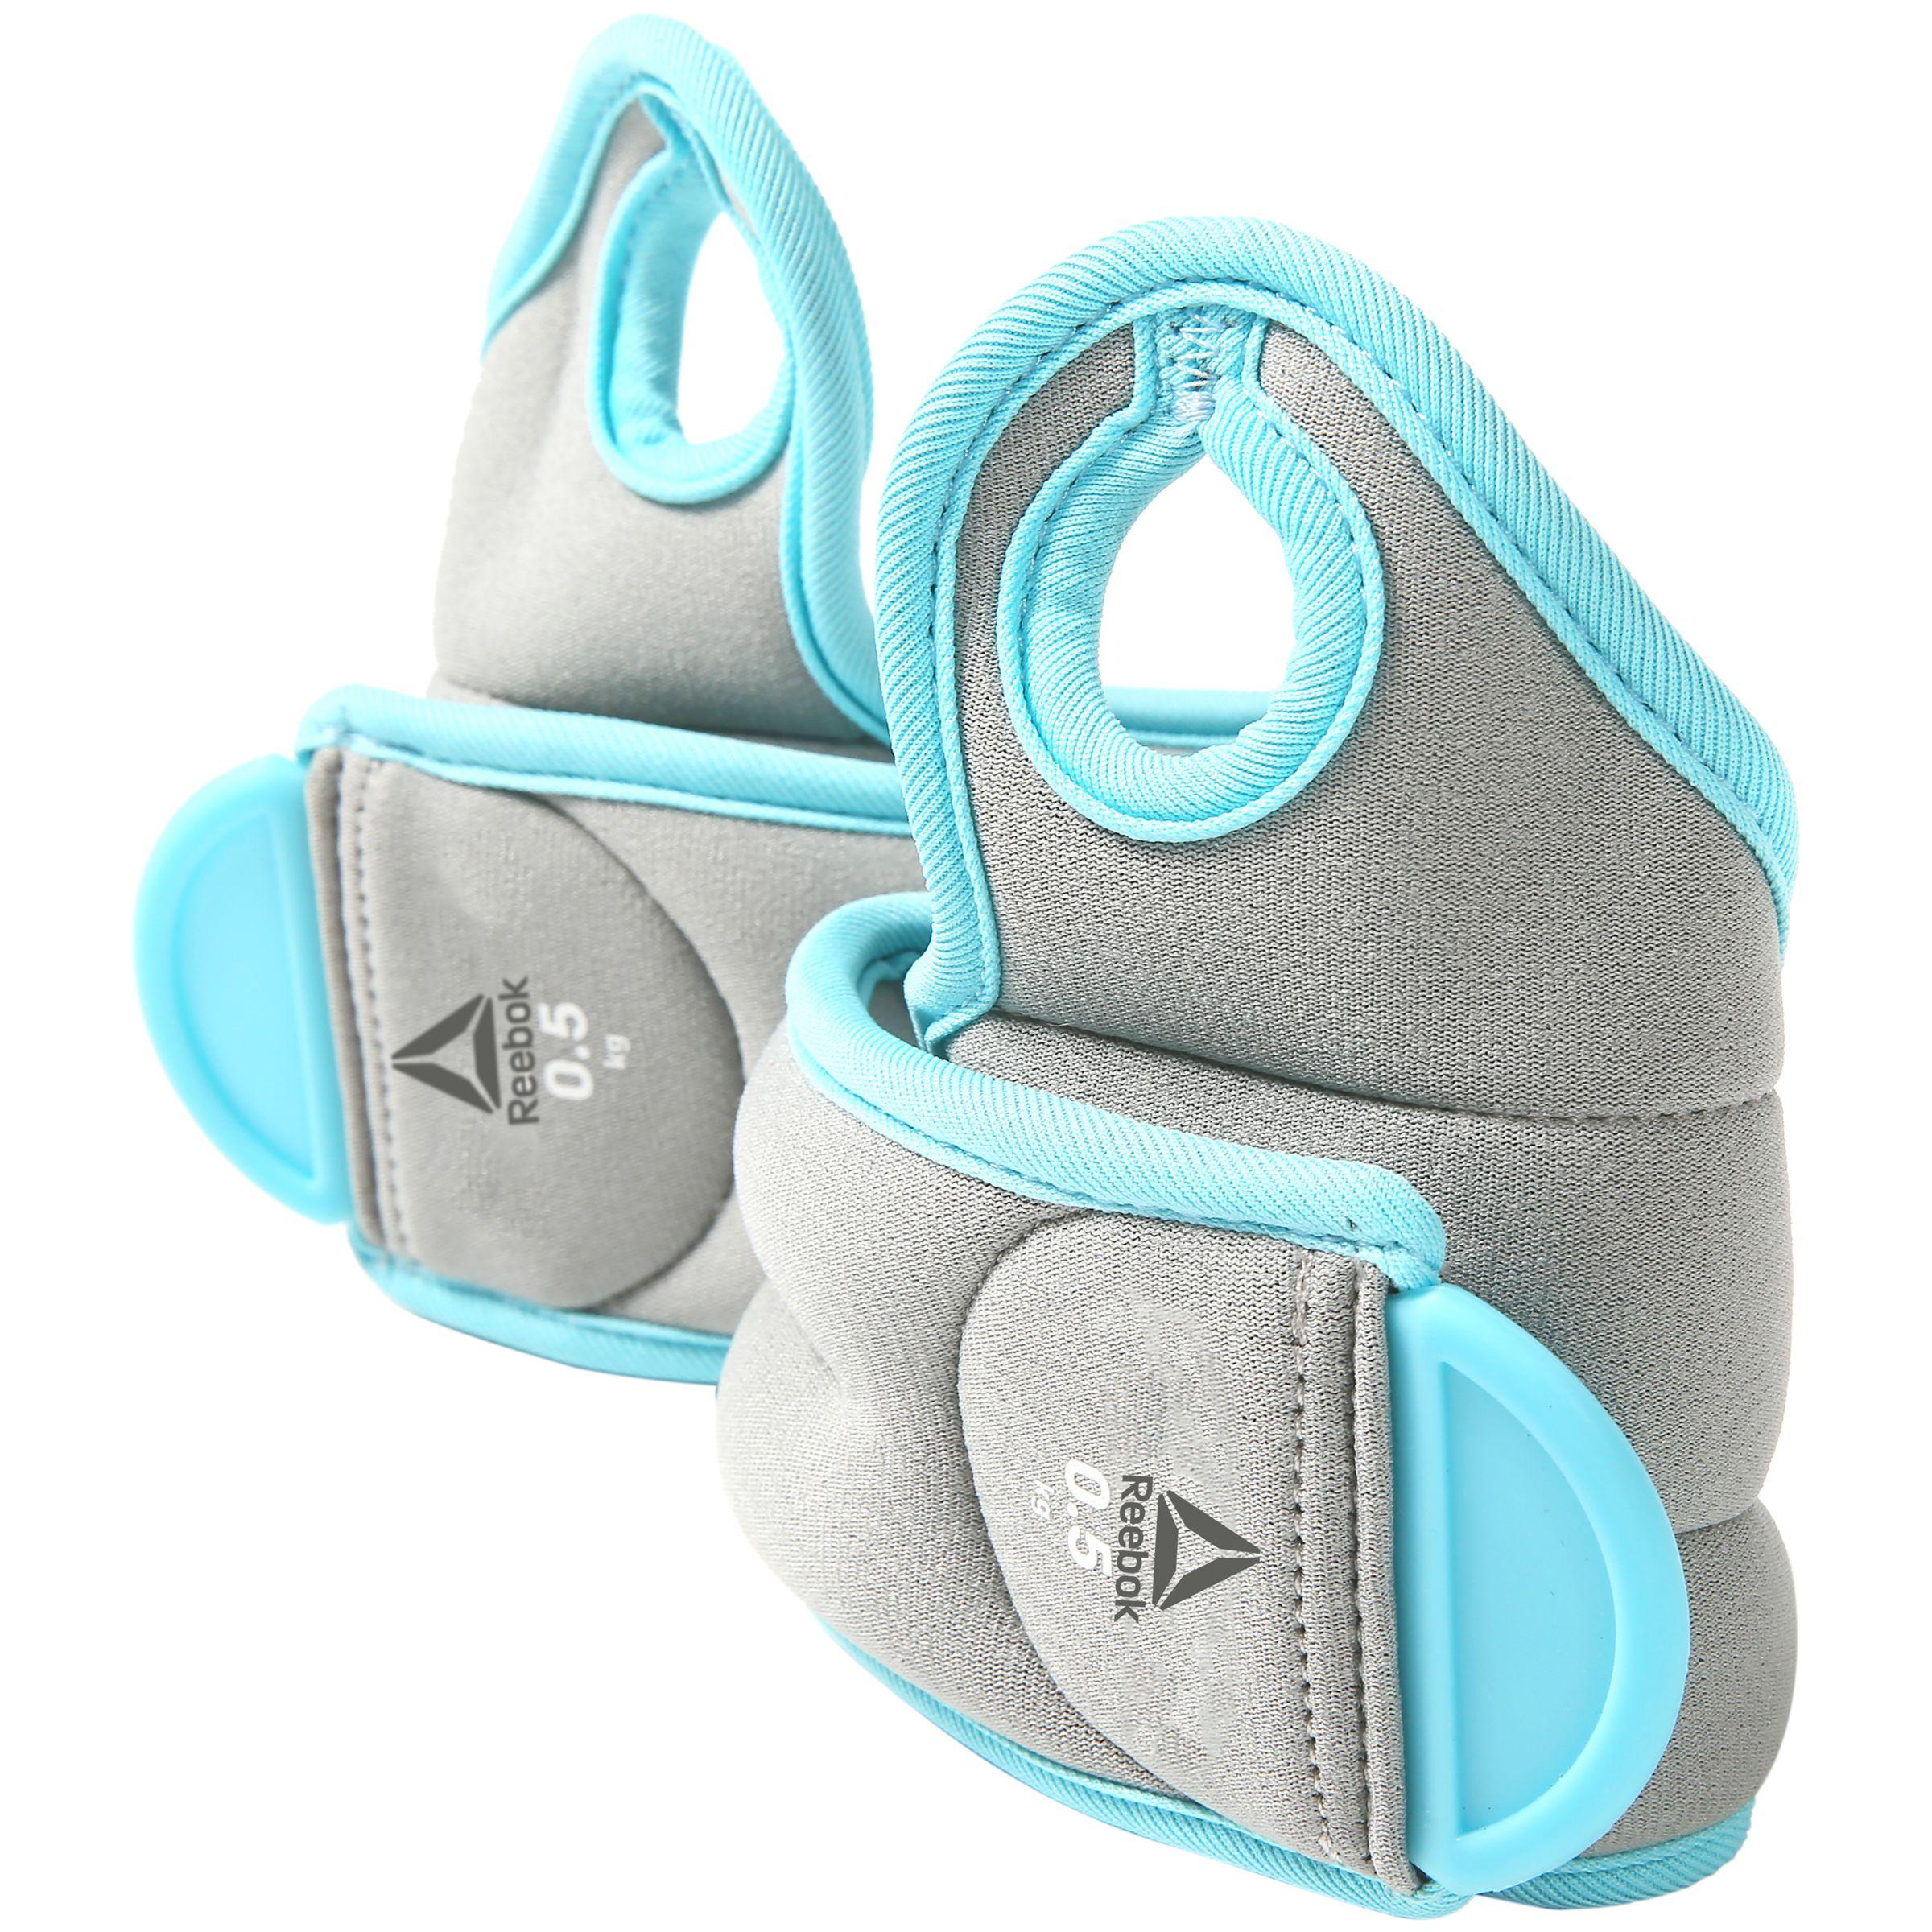 Reebok Reebok Training 2x0.5kg Wrist Weights, Grey/Blue